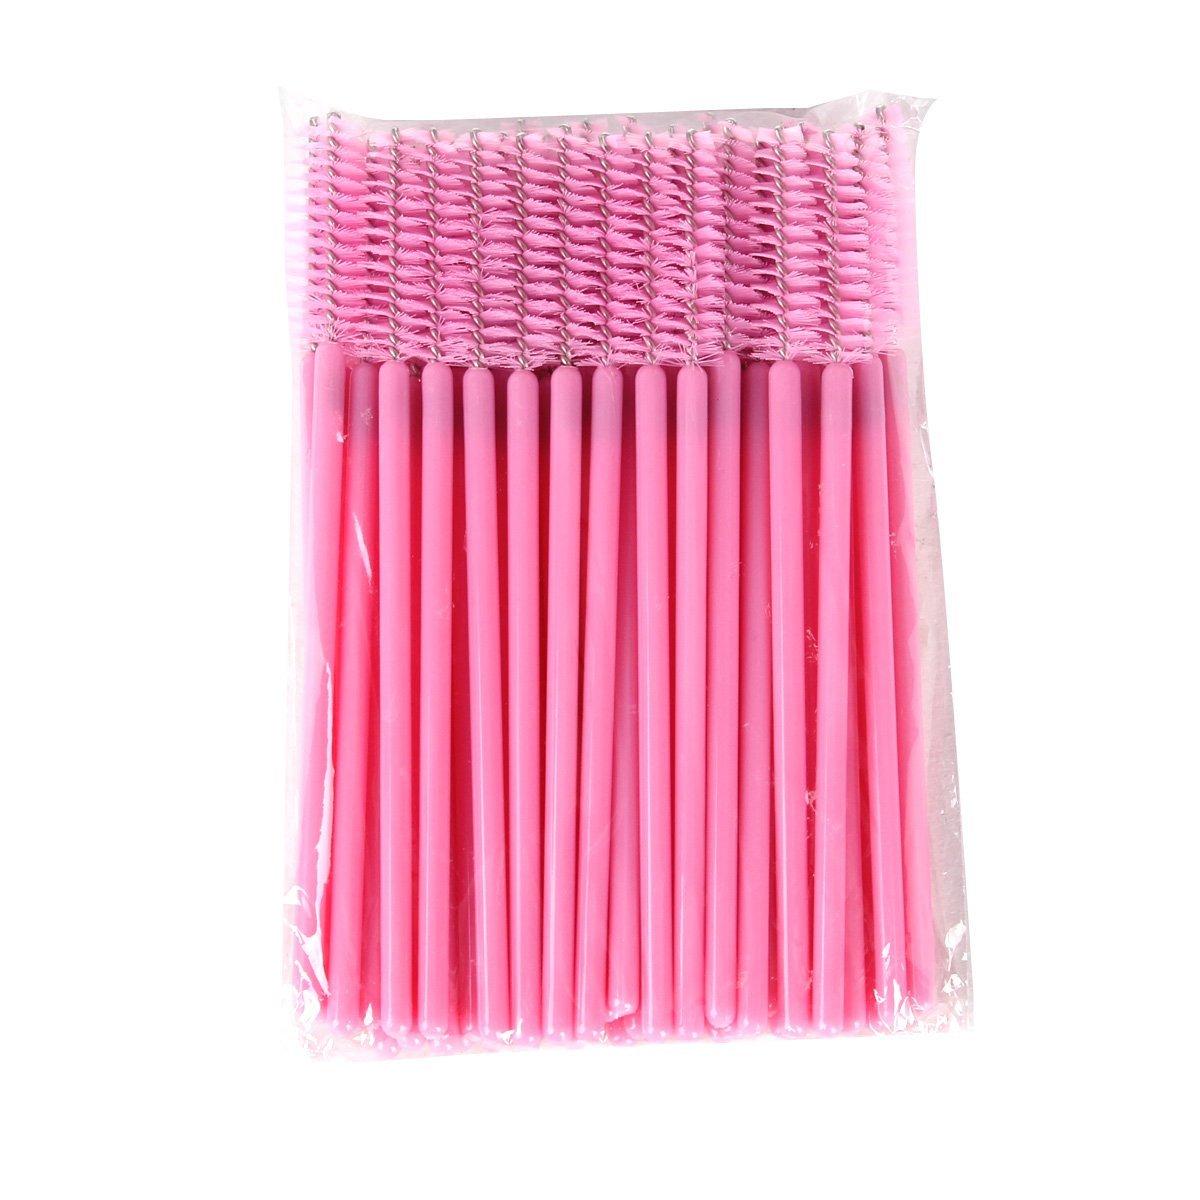 YESURPRISE 50 PCS Disposable Eyelash Brush Mascara Wands Applicator Spoolers Makeup Tool Pink